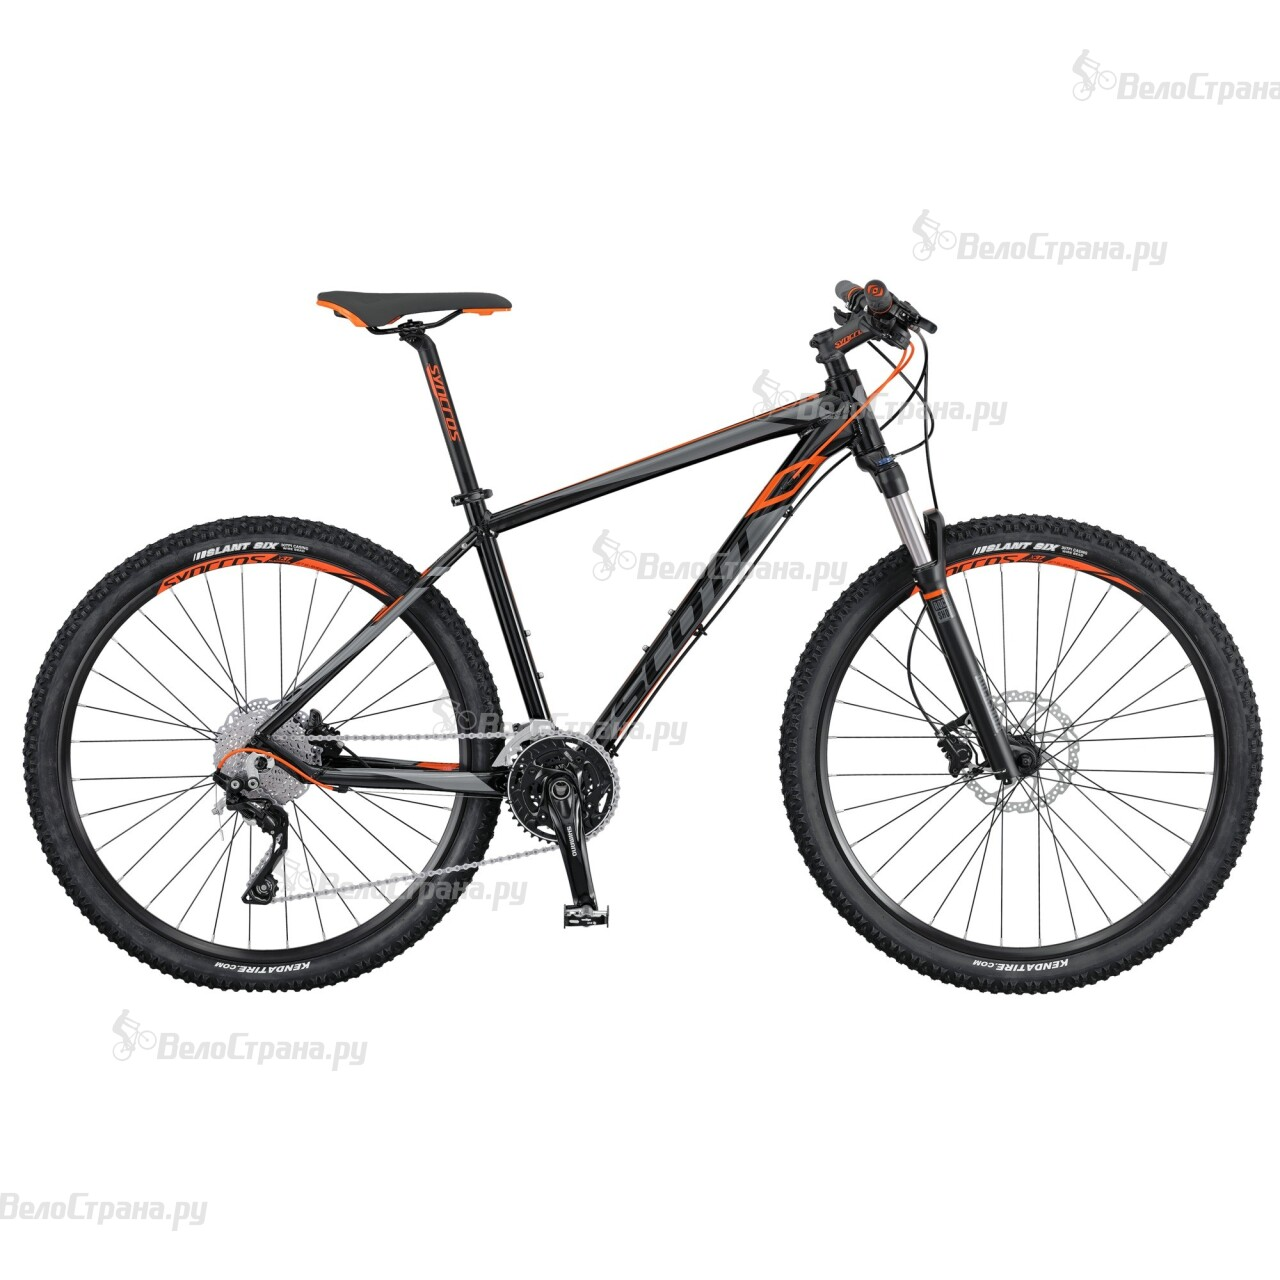 Велосипед Scott Aspect 710 (2016) велосипед scott aspect 700 27 5 2016